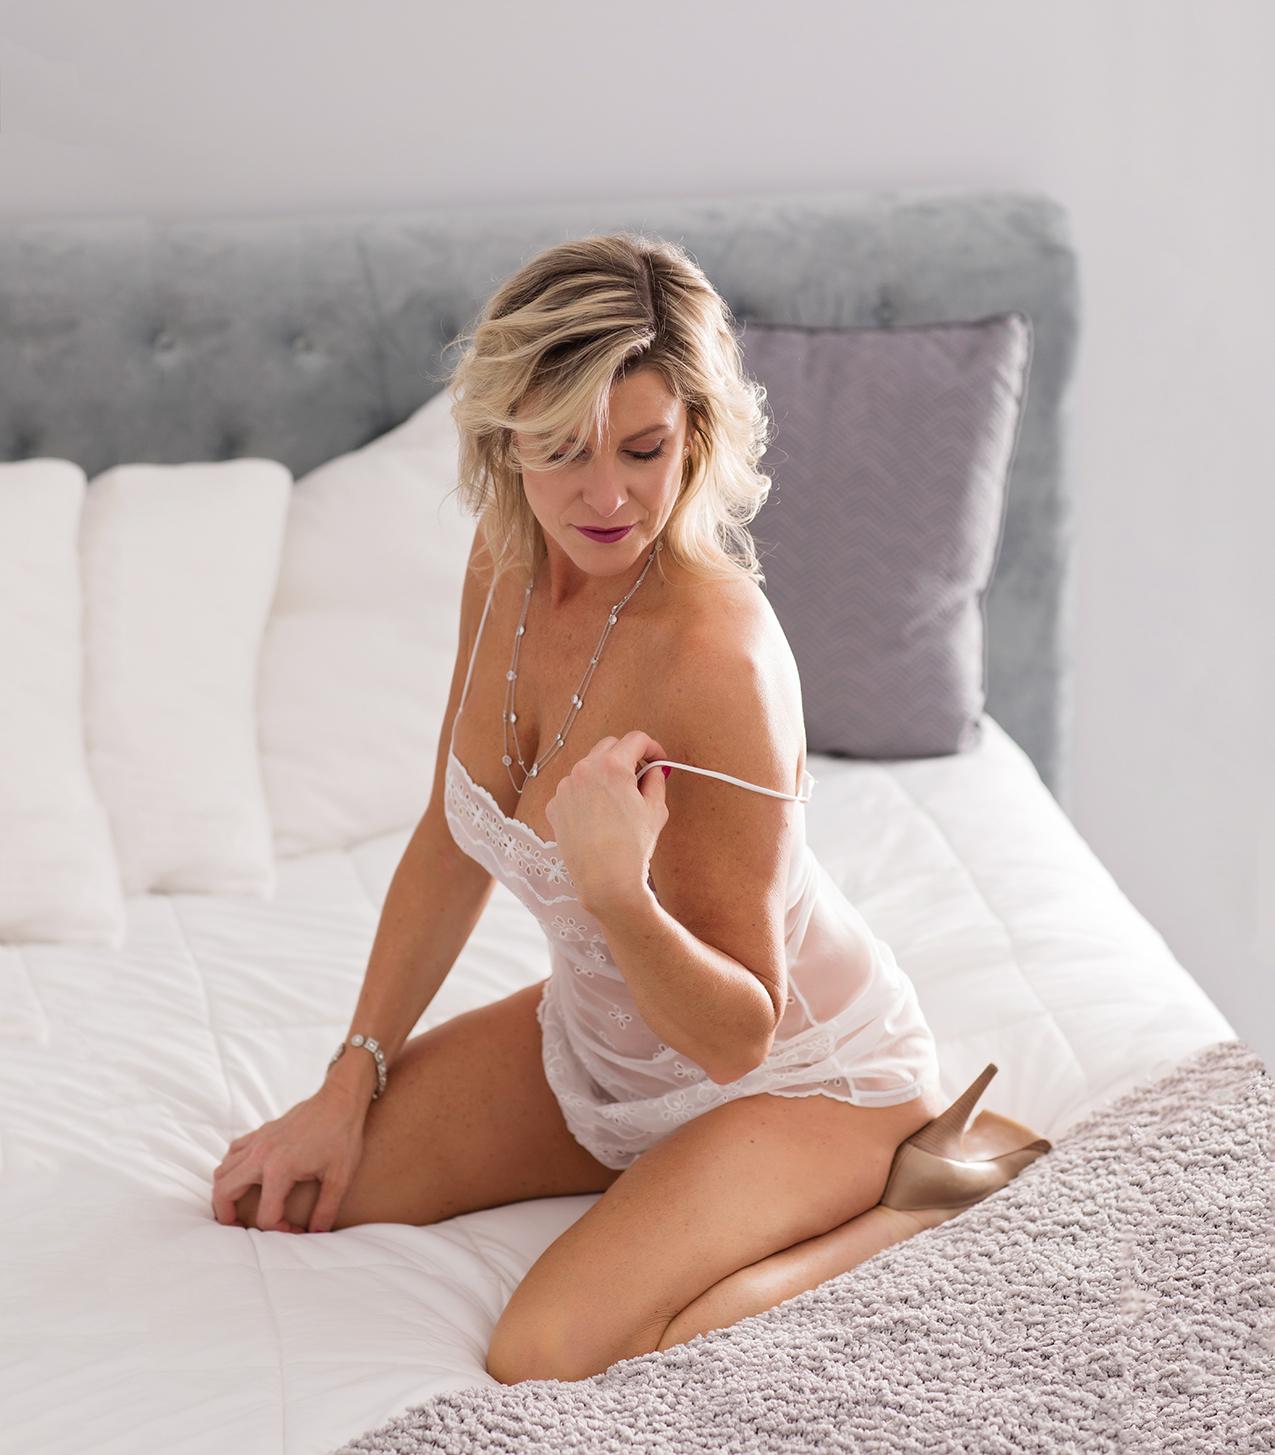 Heidi30.jpg